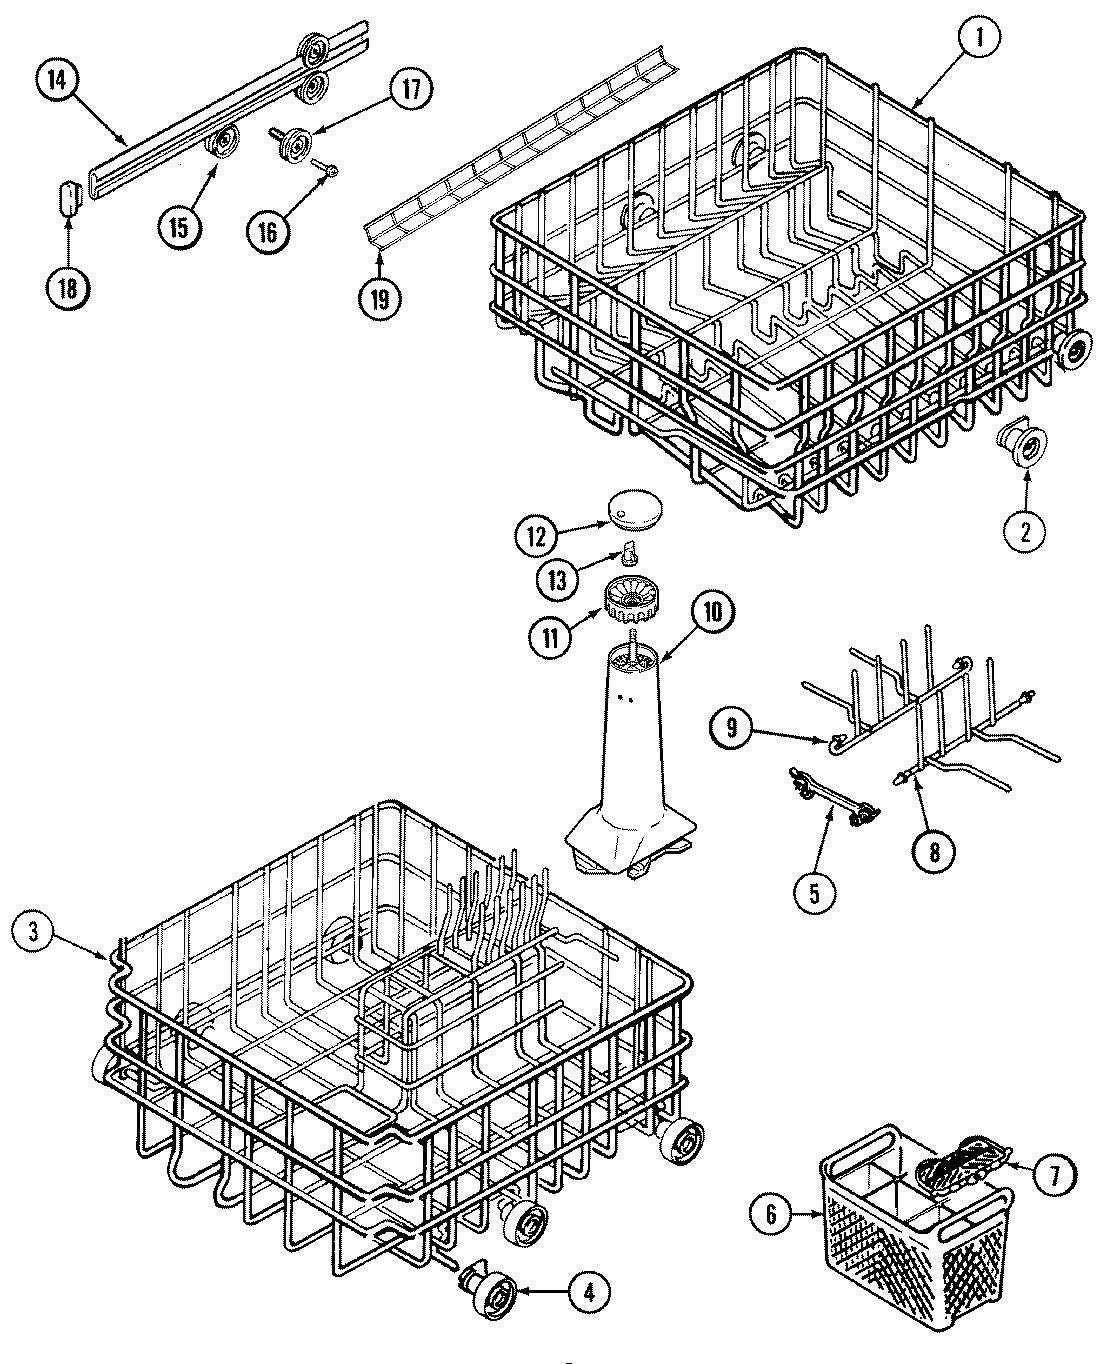 Wiring Code For Dishwasher Dishwasher Installation Code